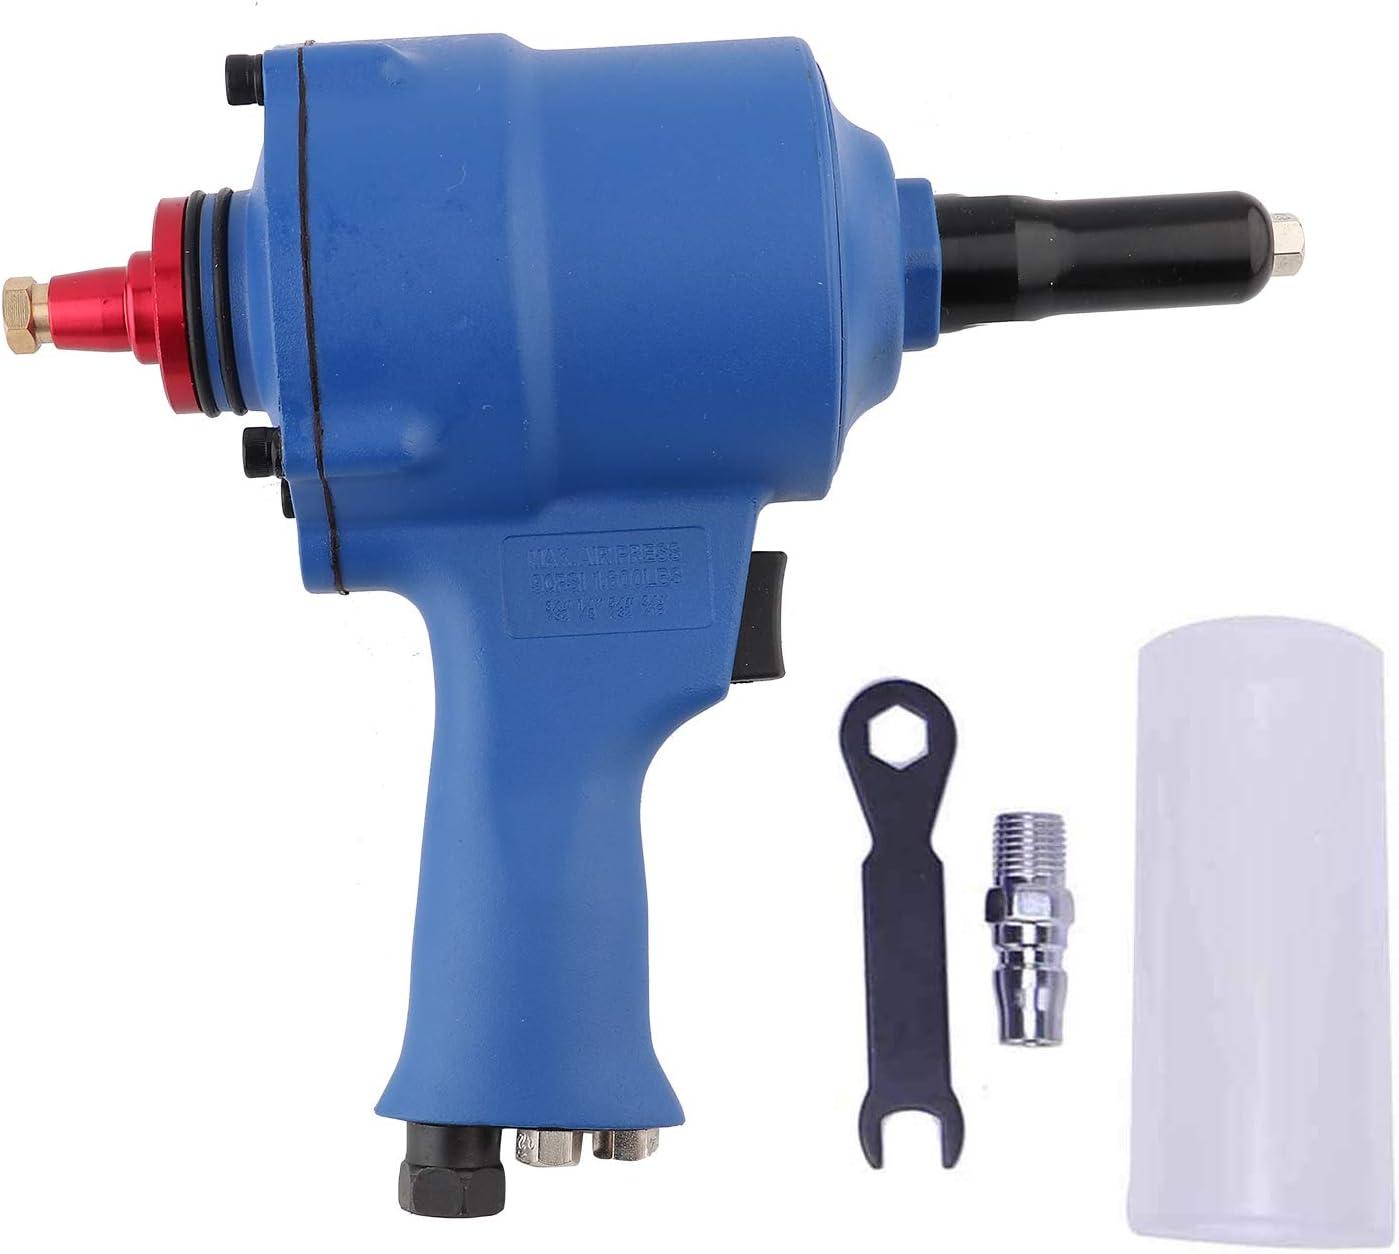 Pneumatic A surprise price is realized Riveter - KP-705X Grip Rivet Pistol 2021 new